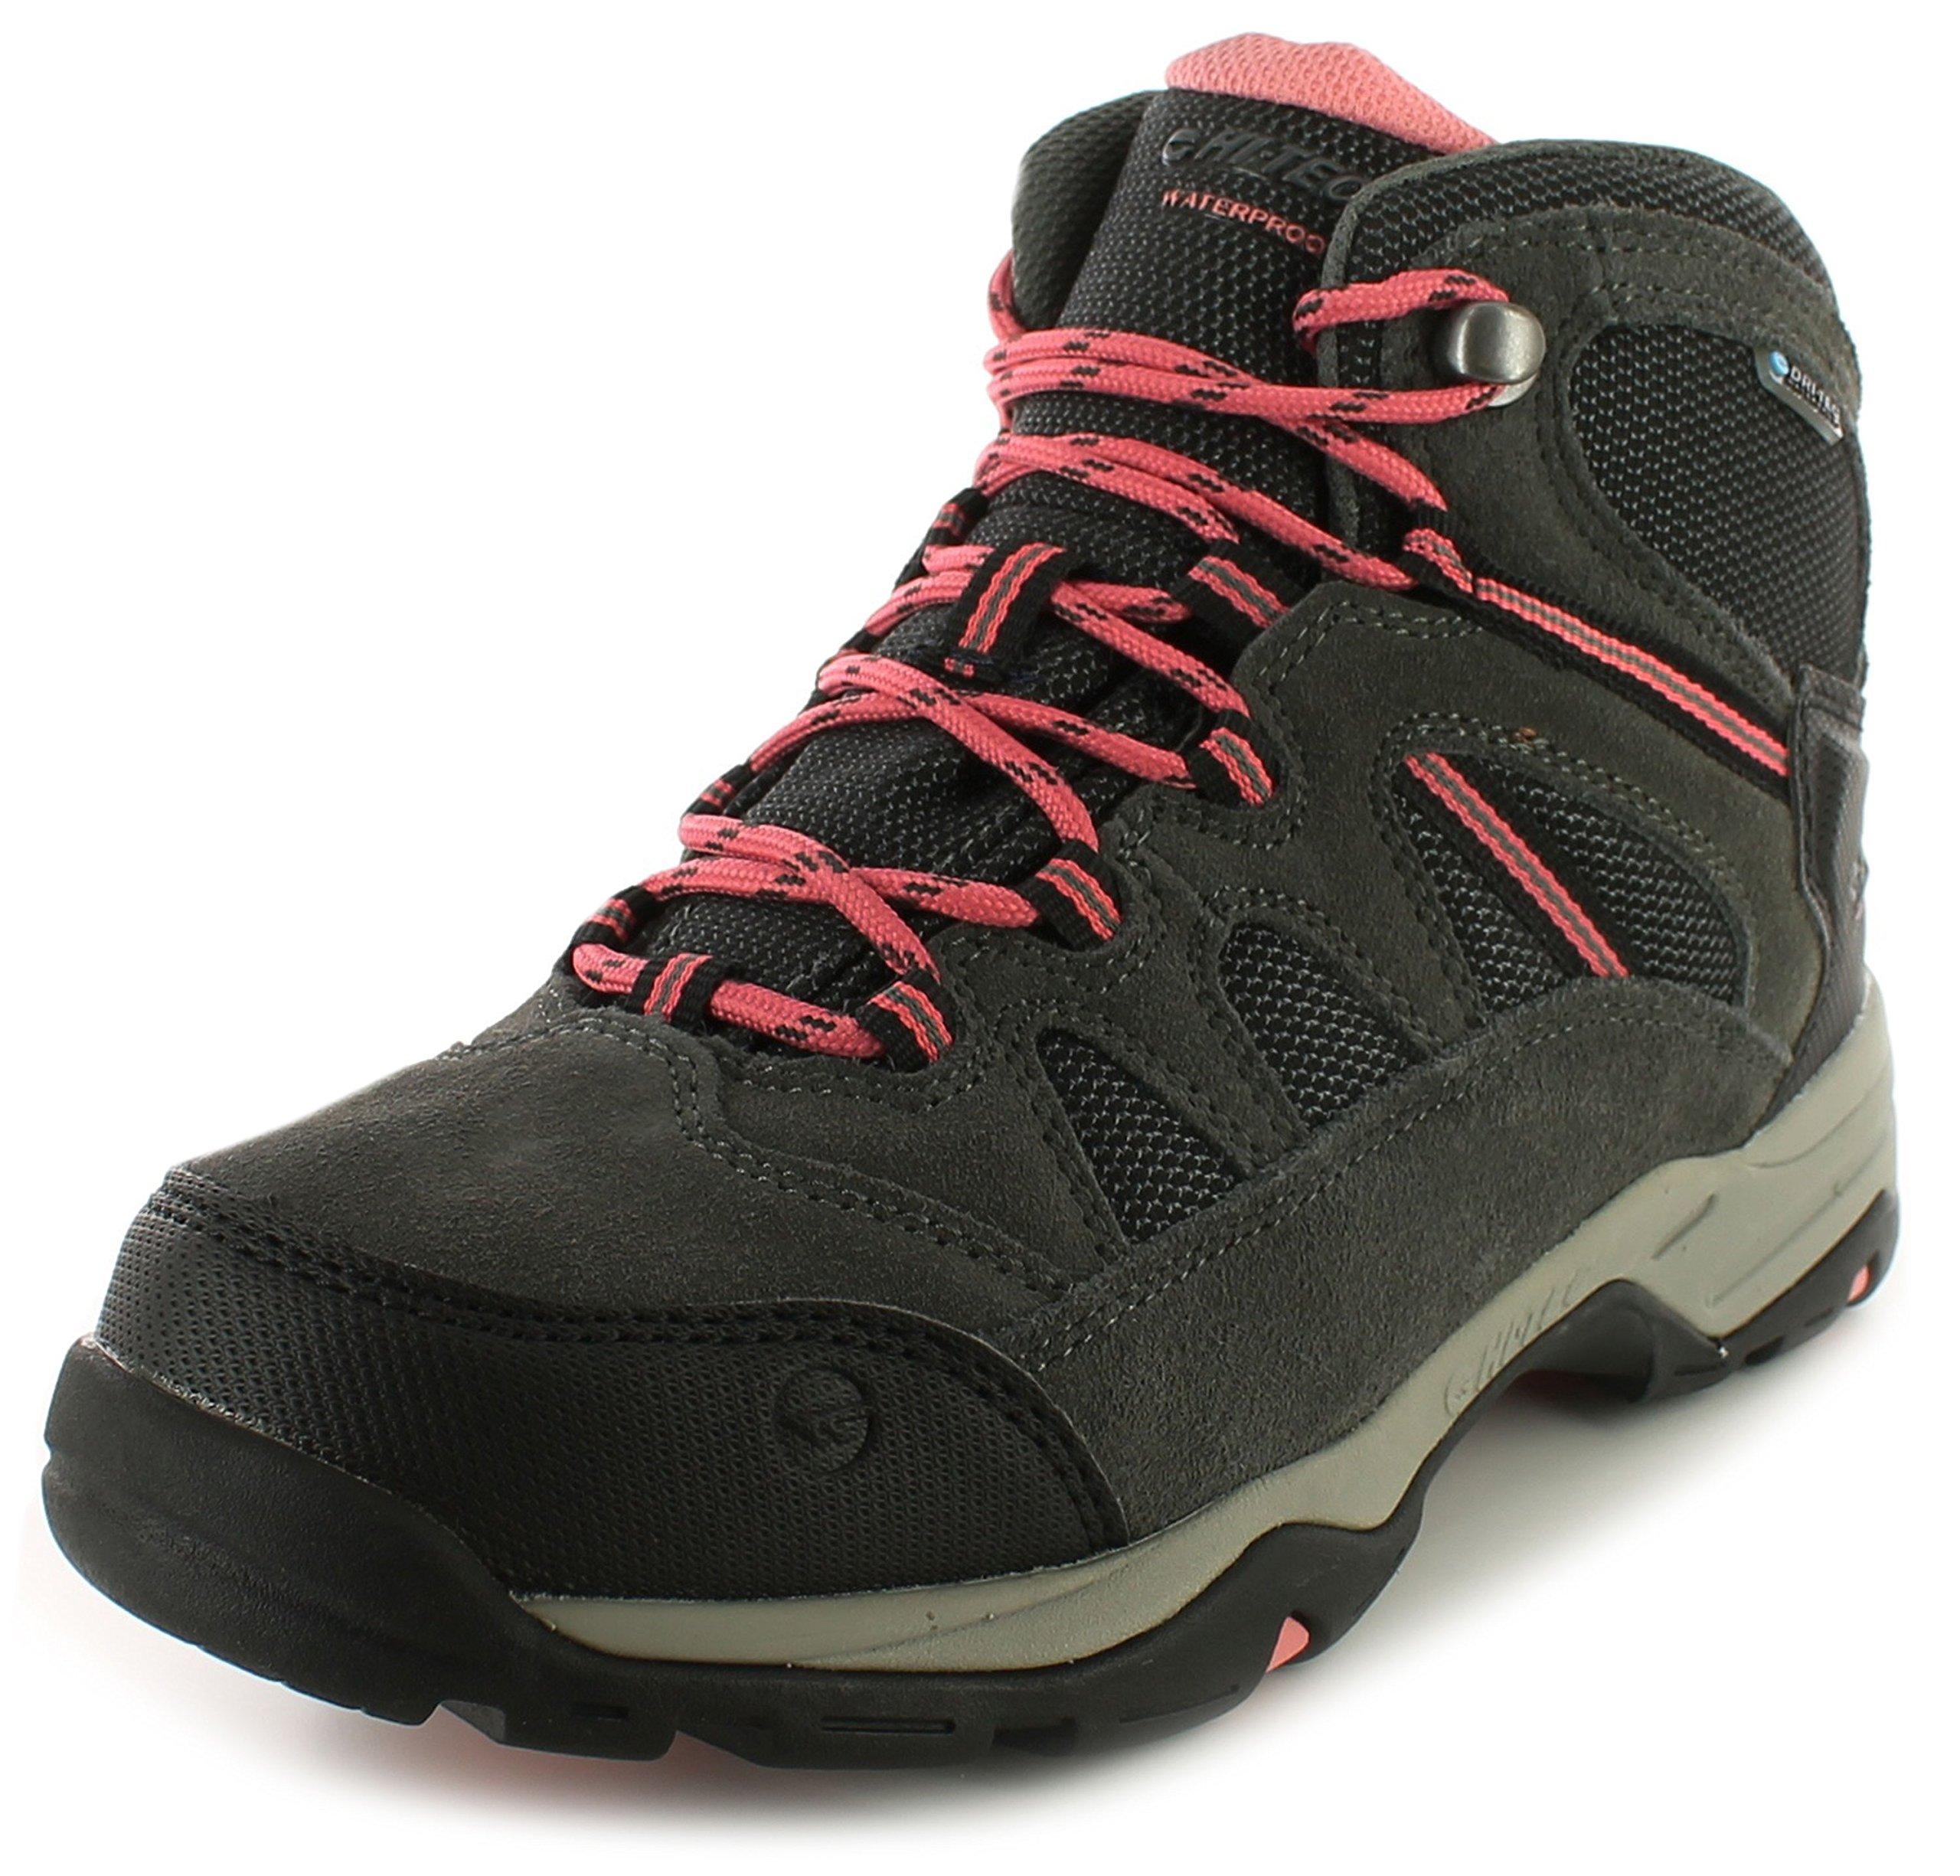 9104pW1sNRL - Hi-Tec Bandera II Mid WP Women's Walking Shoes